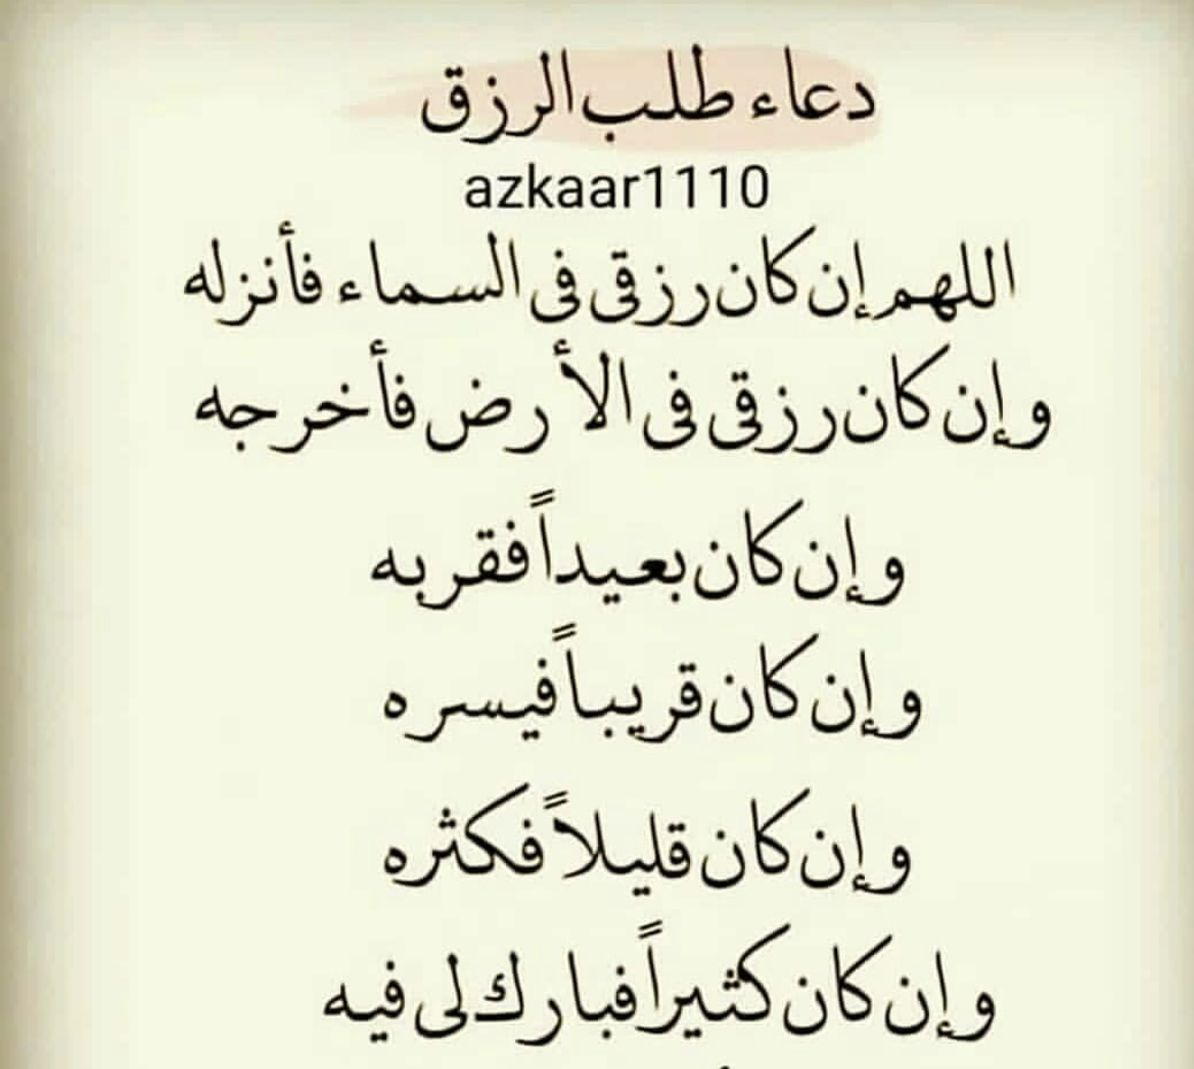 يارب يا رزاق Quran Quotes Love Mom Birthday Quotes Quran Quotes